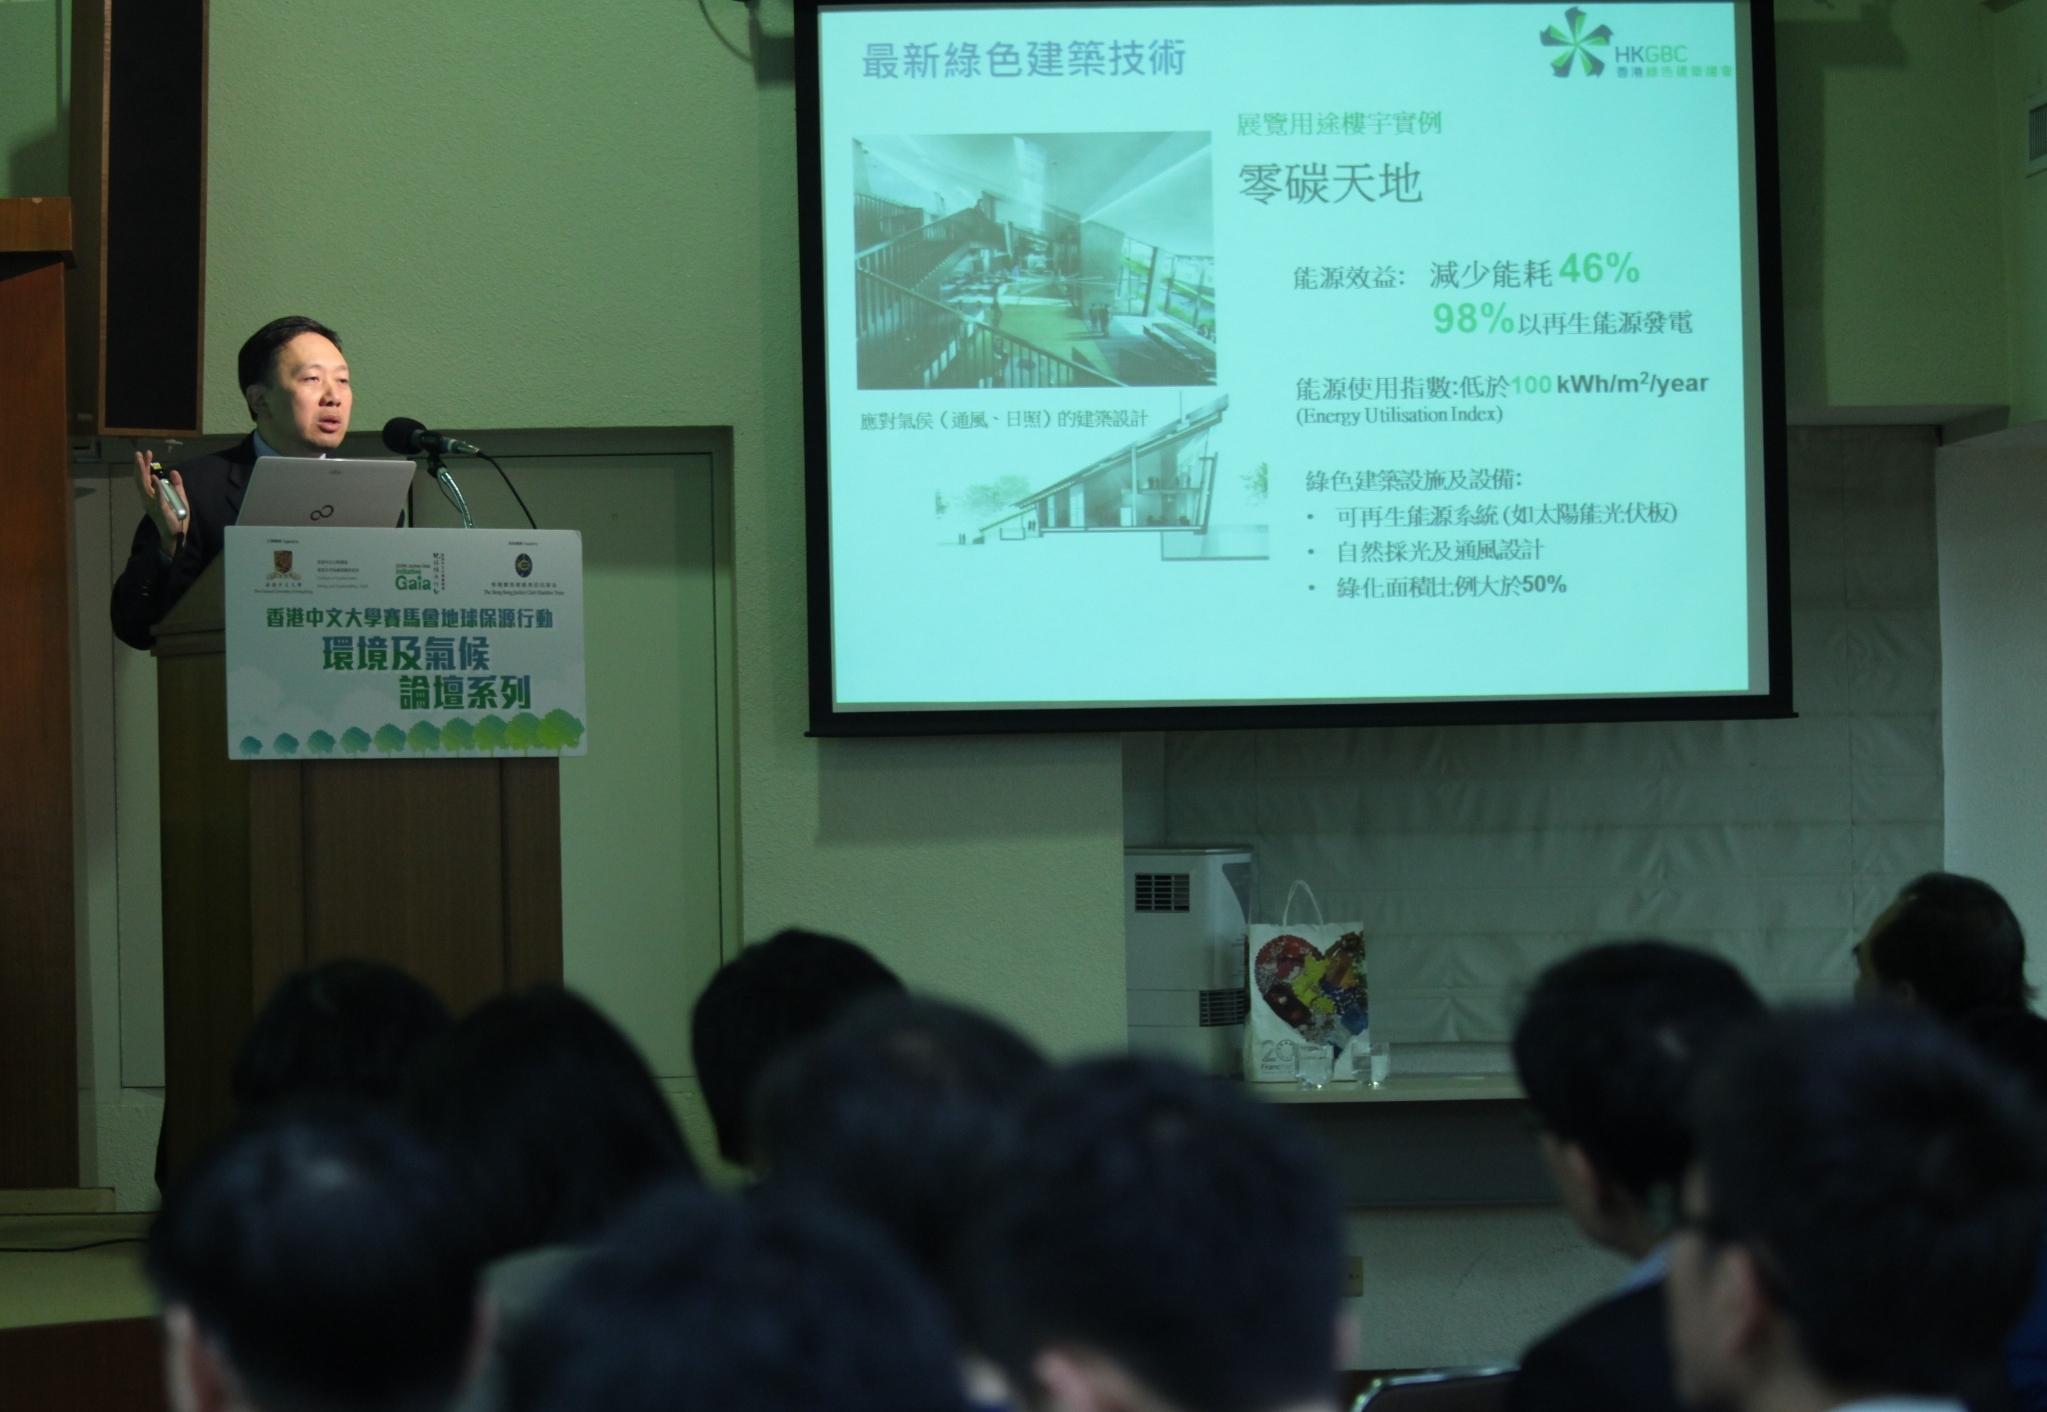 Keynote speech by Ir Conrad T C WONG, Chairman, Hong Kong Green Building Council.